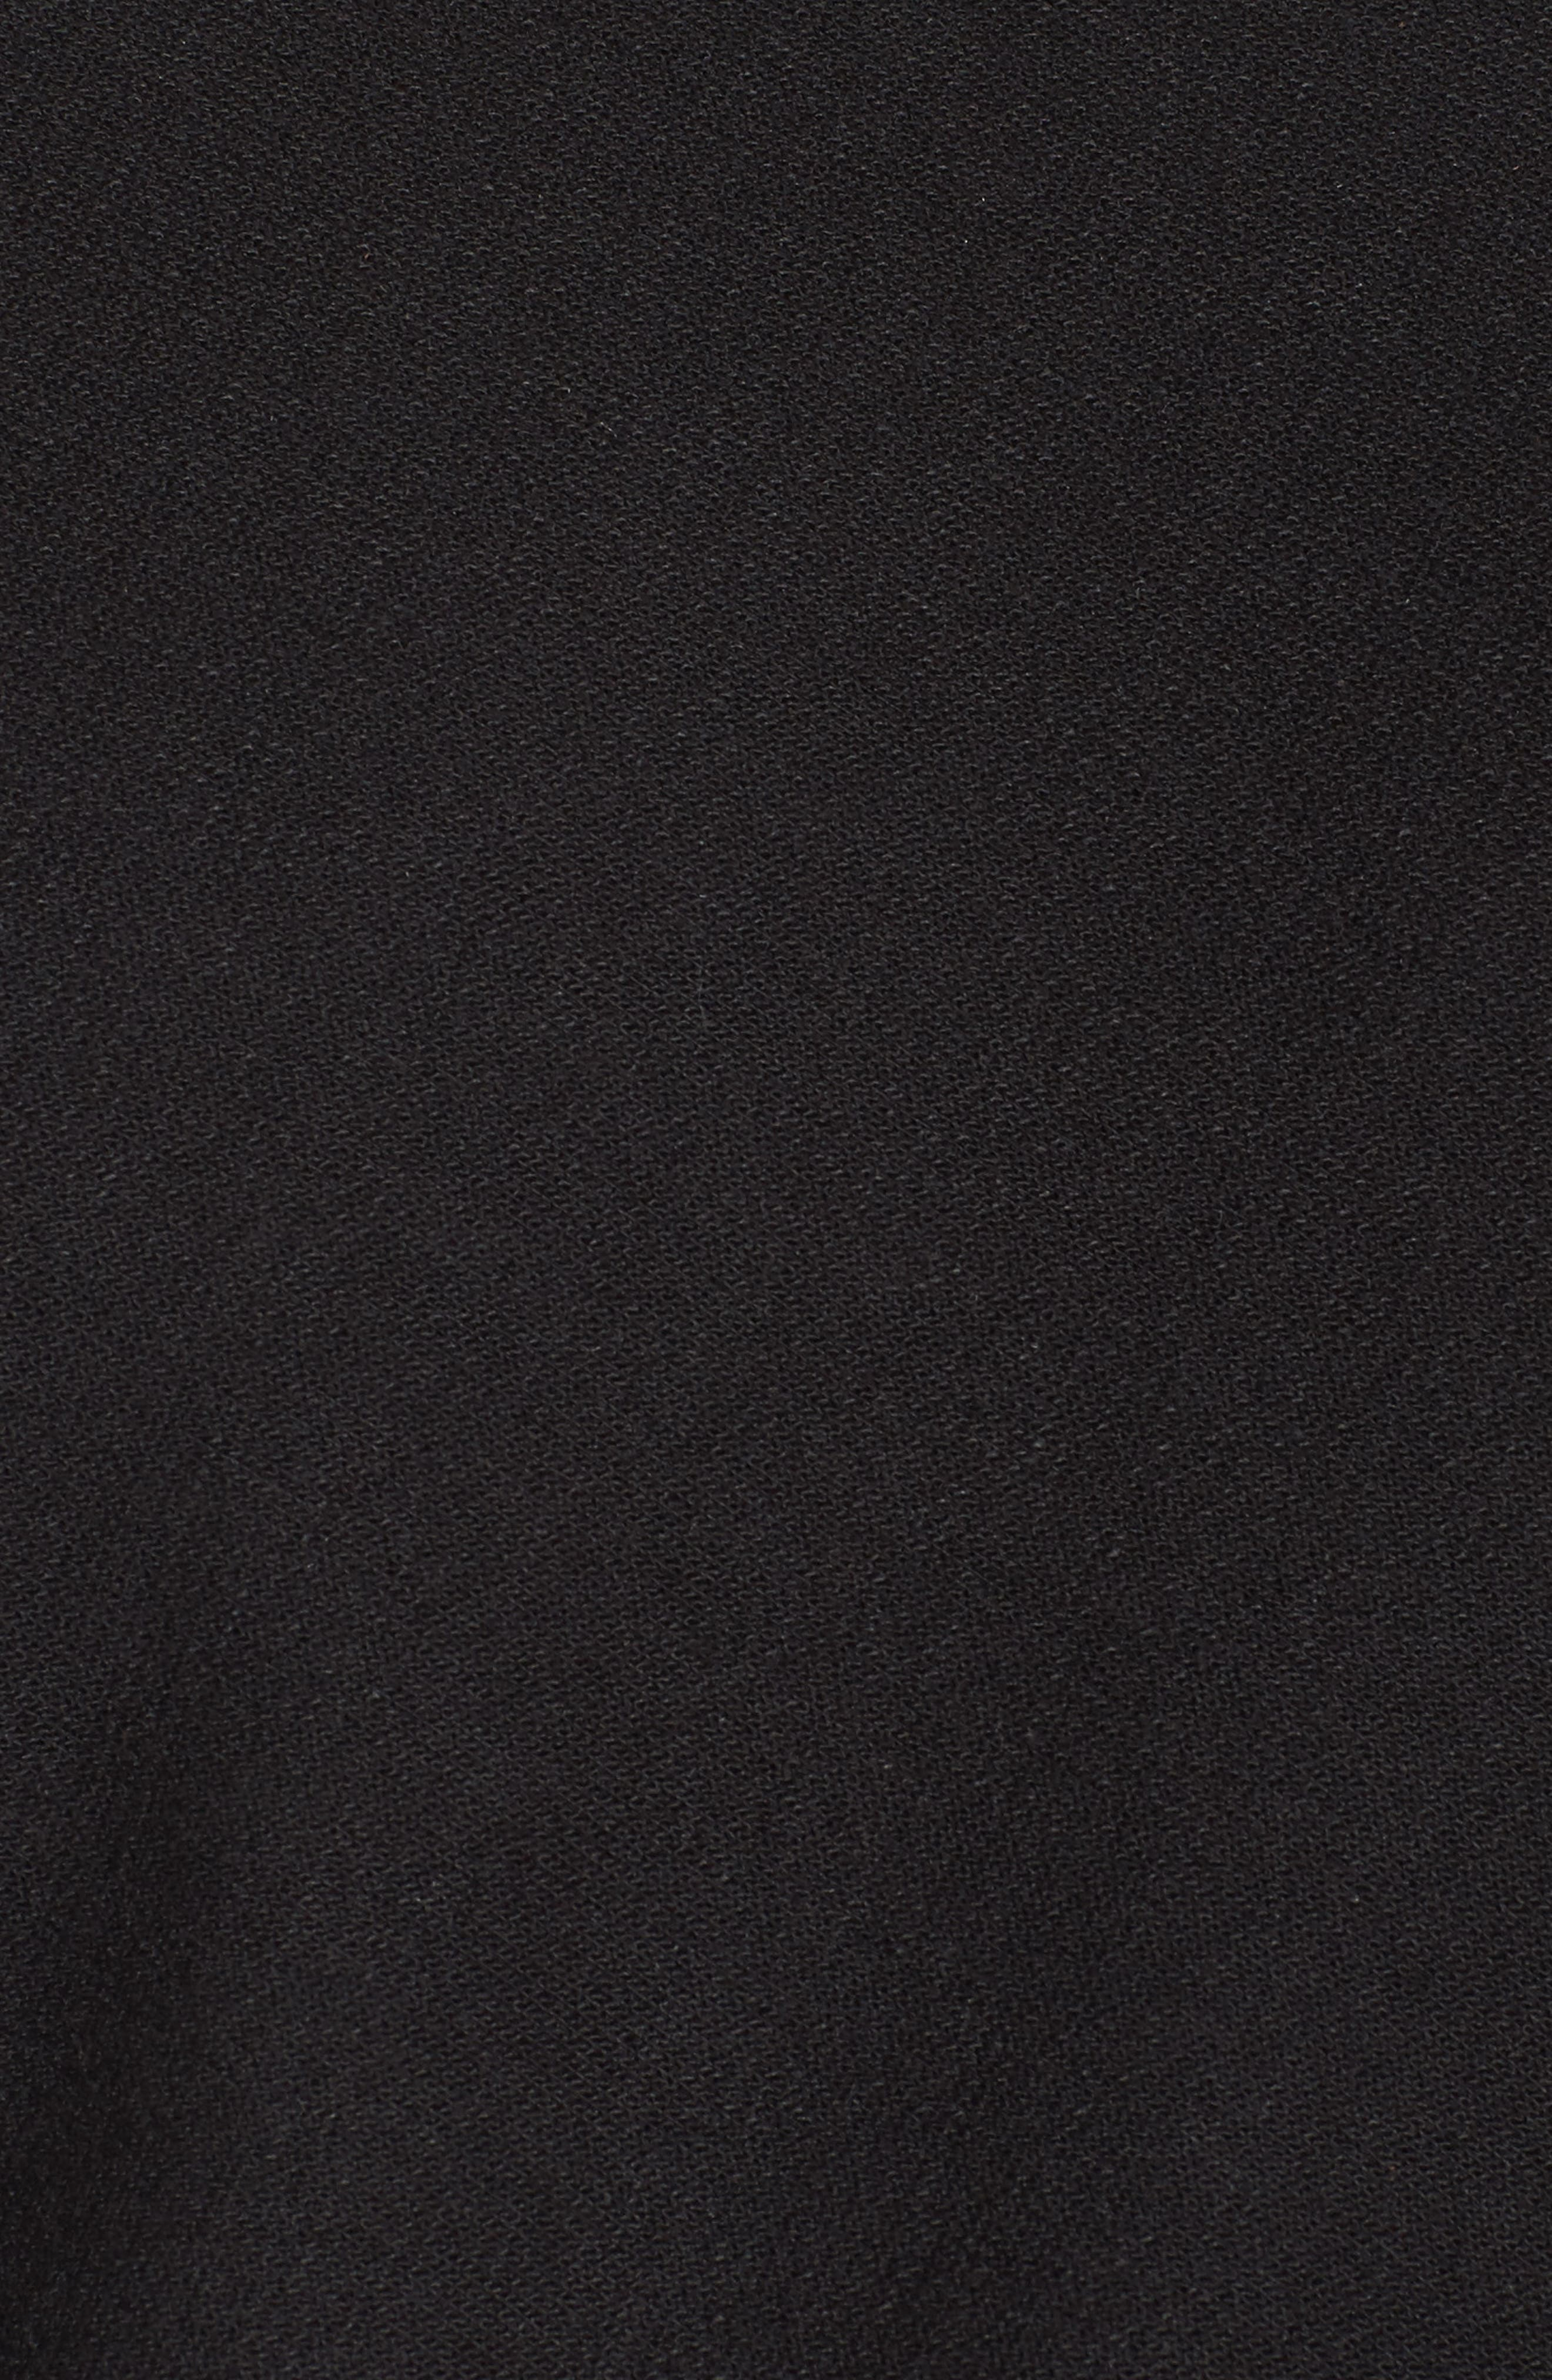 Soleil Funnel Neck Crop Pullover,                             Alternate thumbnail 6, color,                             001